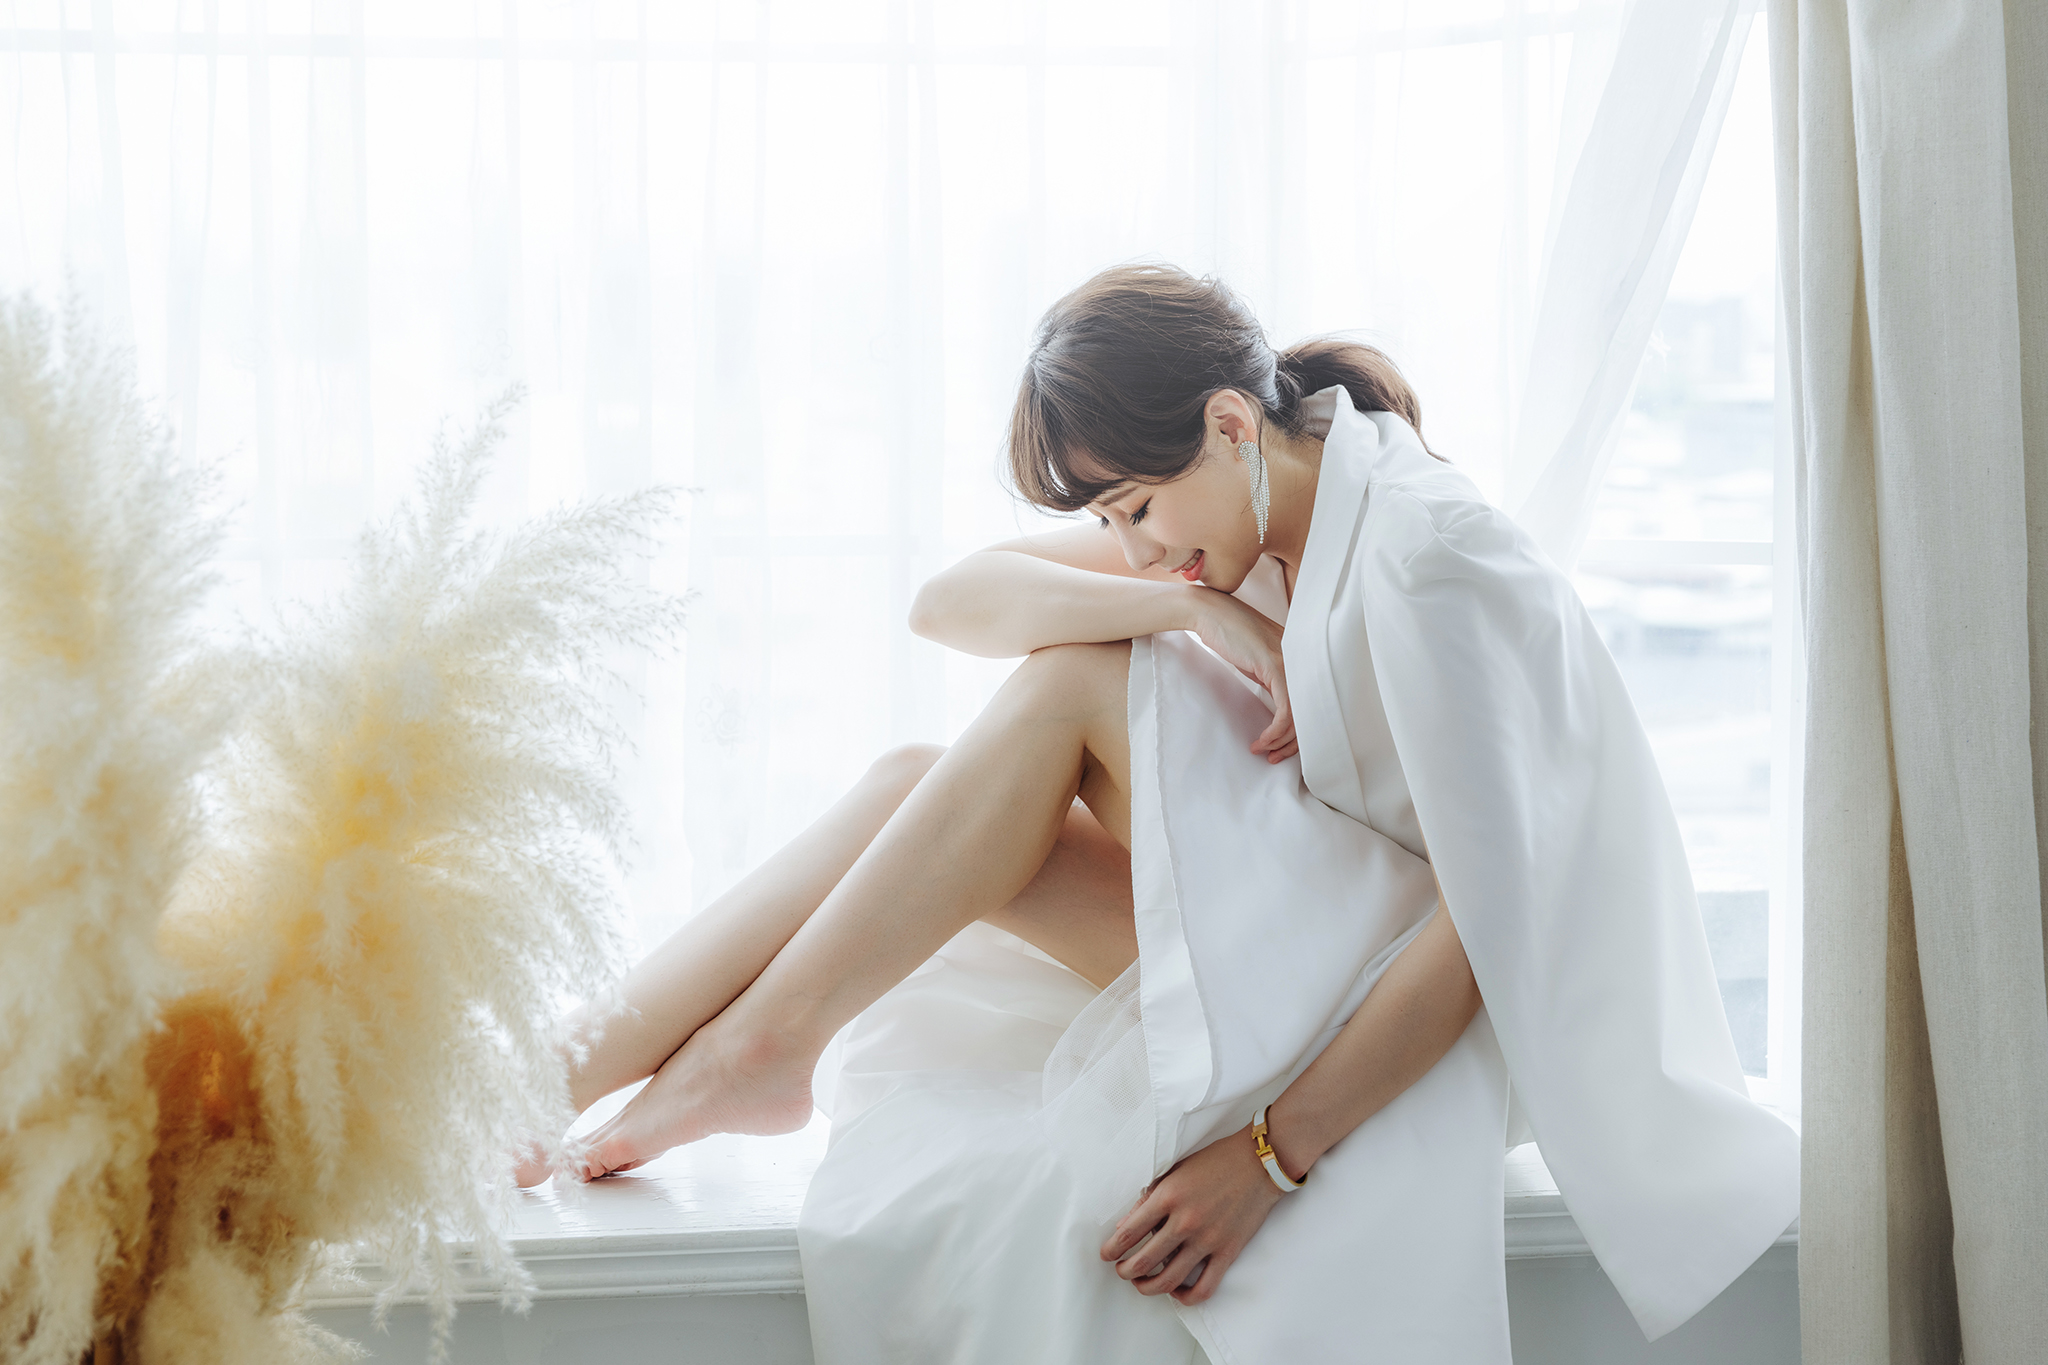 49883210251 b391ea9229 o - 【自主婚紗】+潤潤+